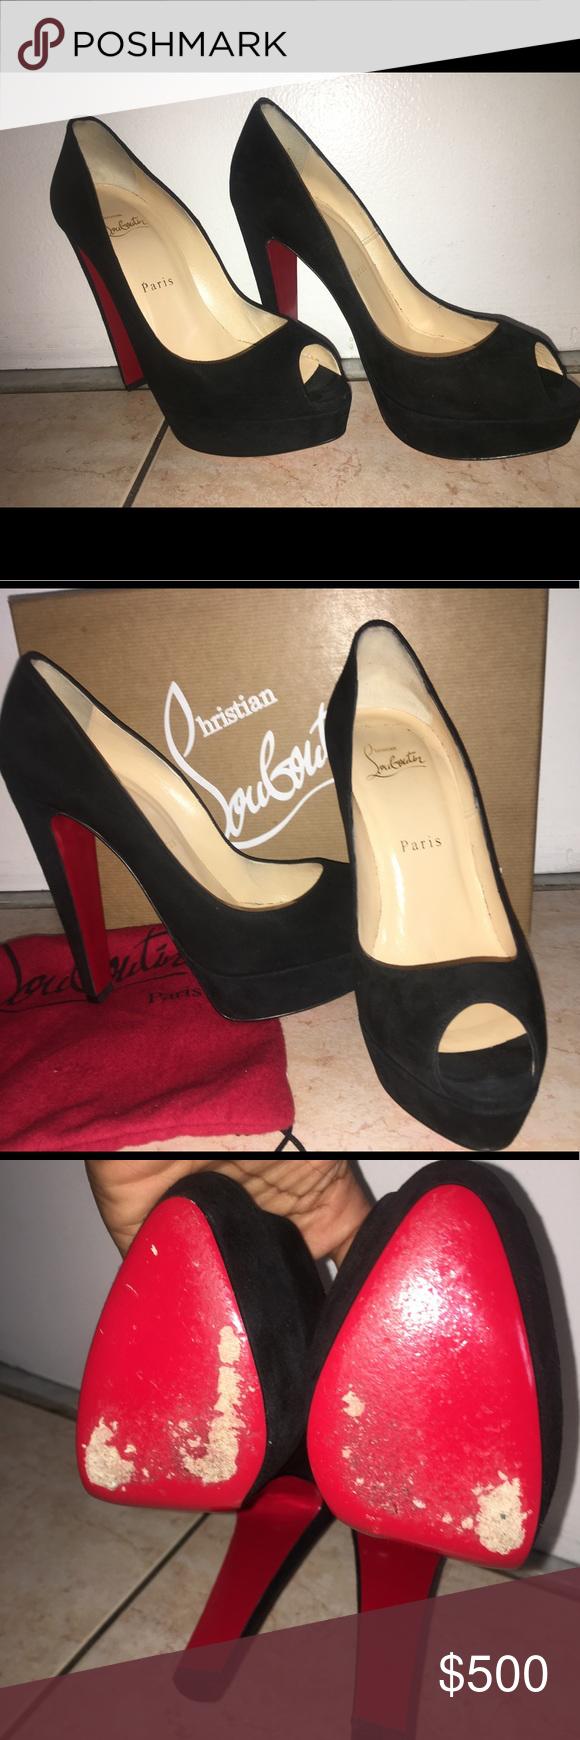 online retailer 74b11 946ea Christian Louboutin Altanana 140 Black Suede Peep Toe Pump ...